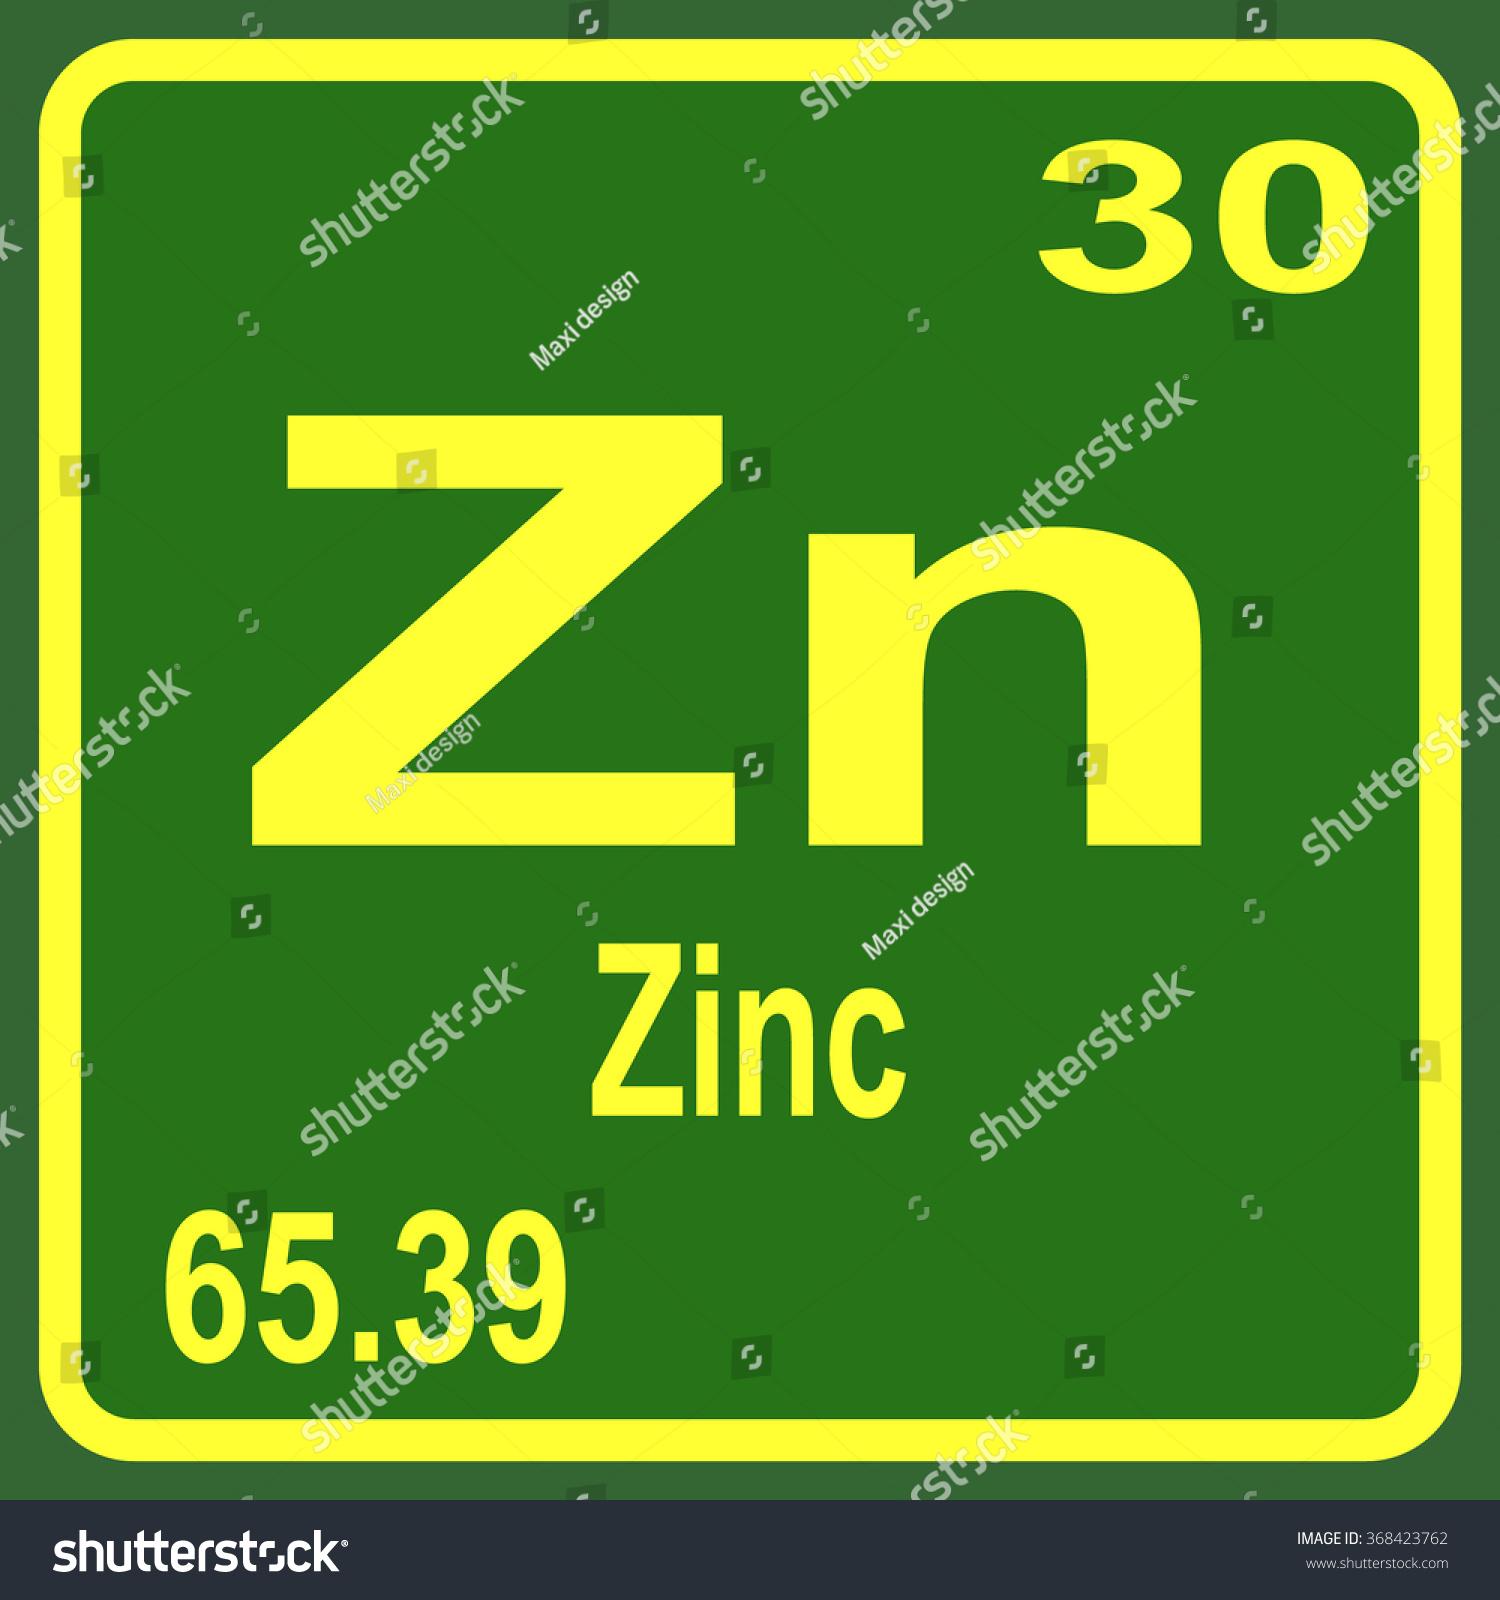 Zinc in periodic table gallery periodic table images element zn periodic table image collections periodic table images periodic table of elements zinc stock vector gamestrikefo Gallery